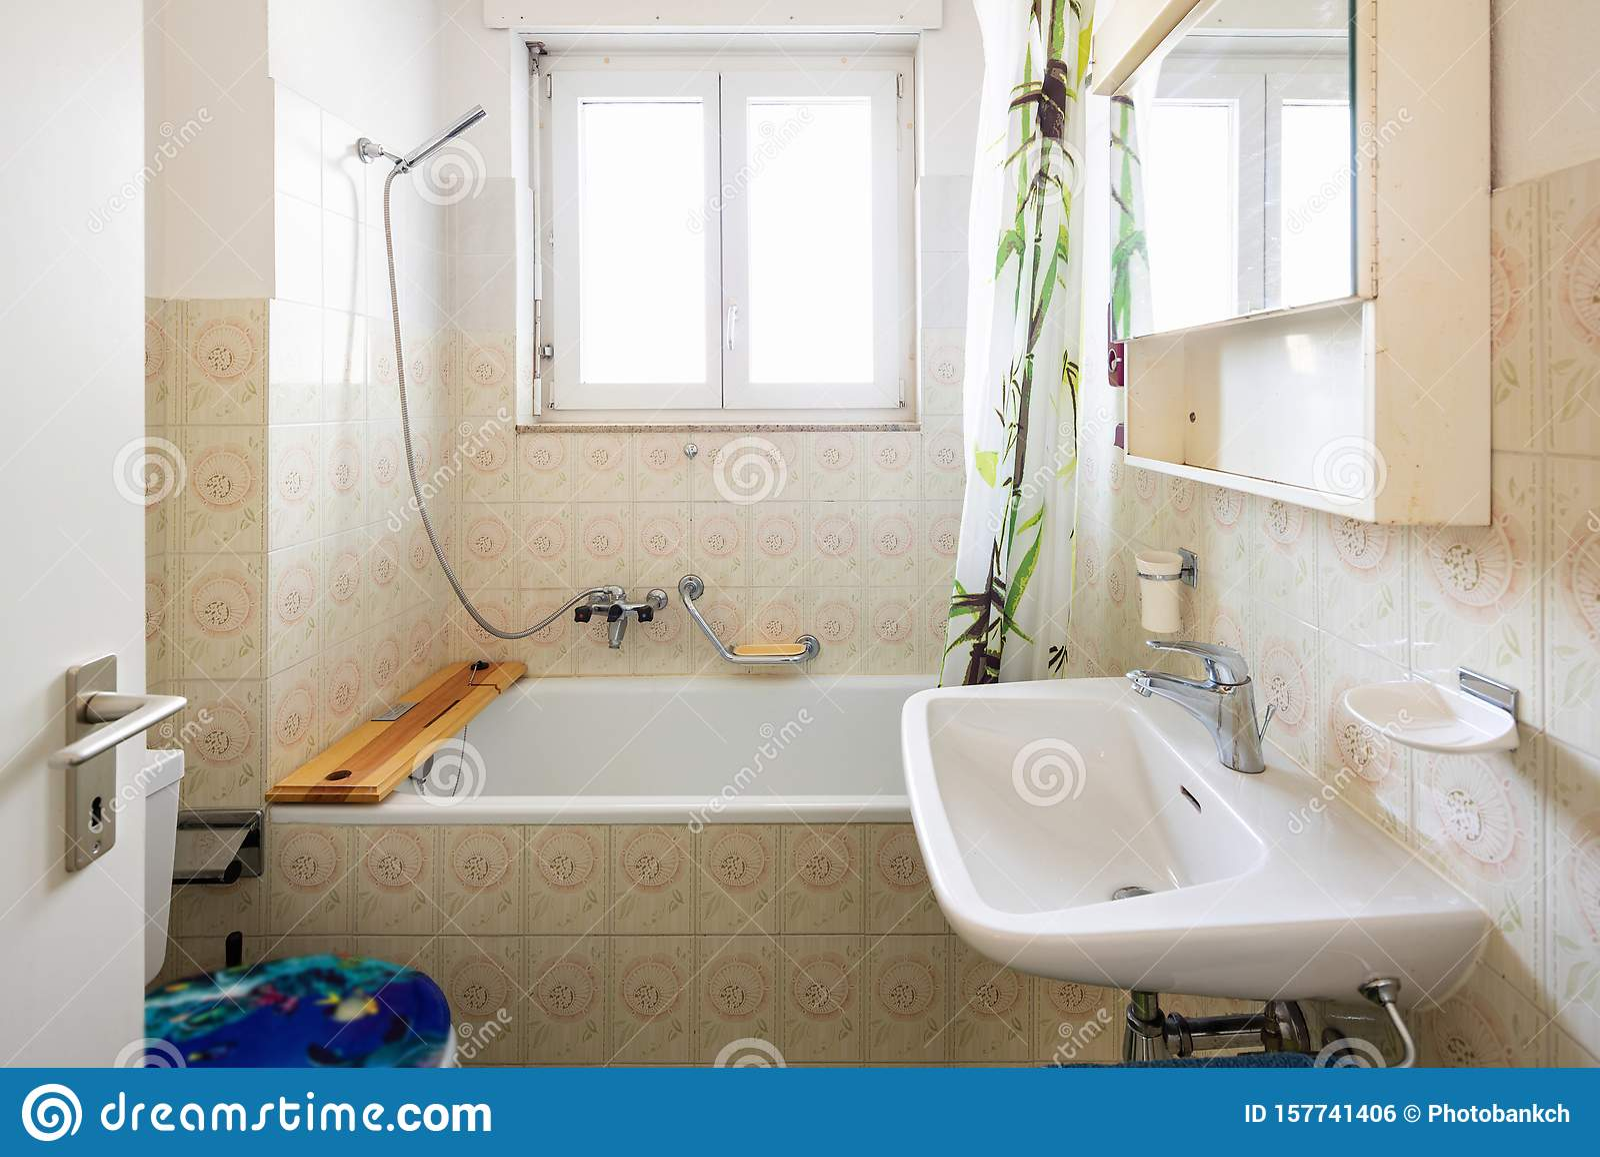 https www dreamstime com vintage bathroom green tiles window vintage bathroom green tiles window nobody inside window image157741406